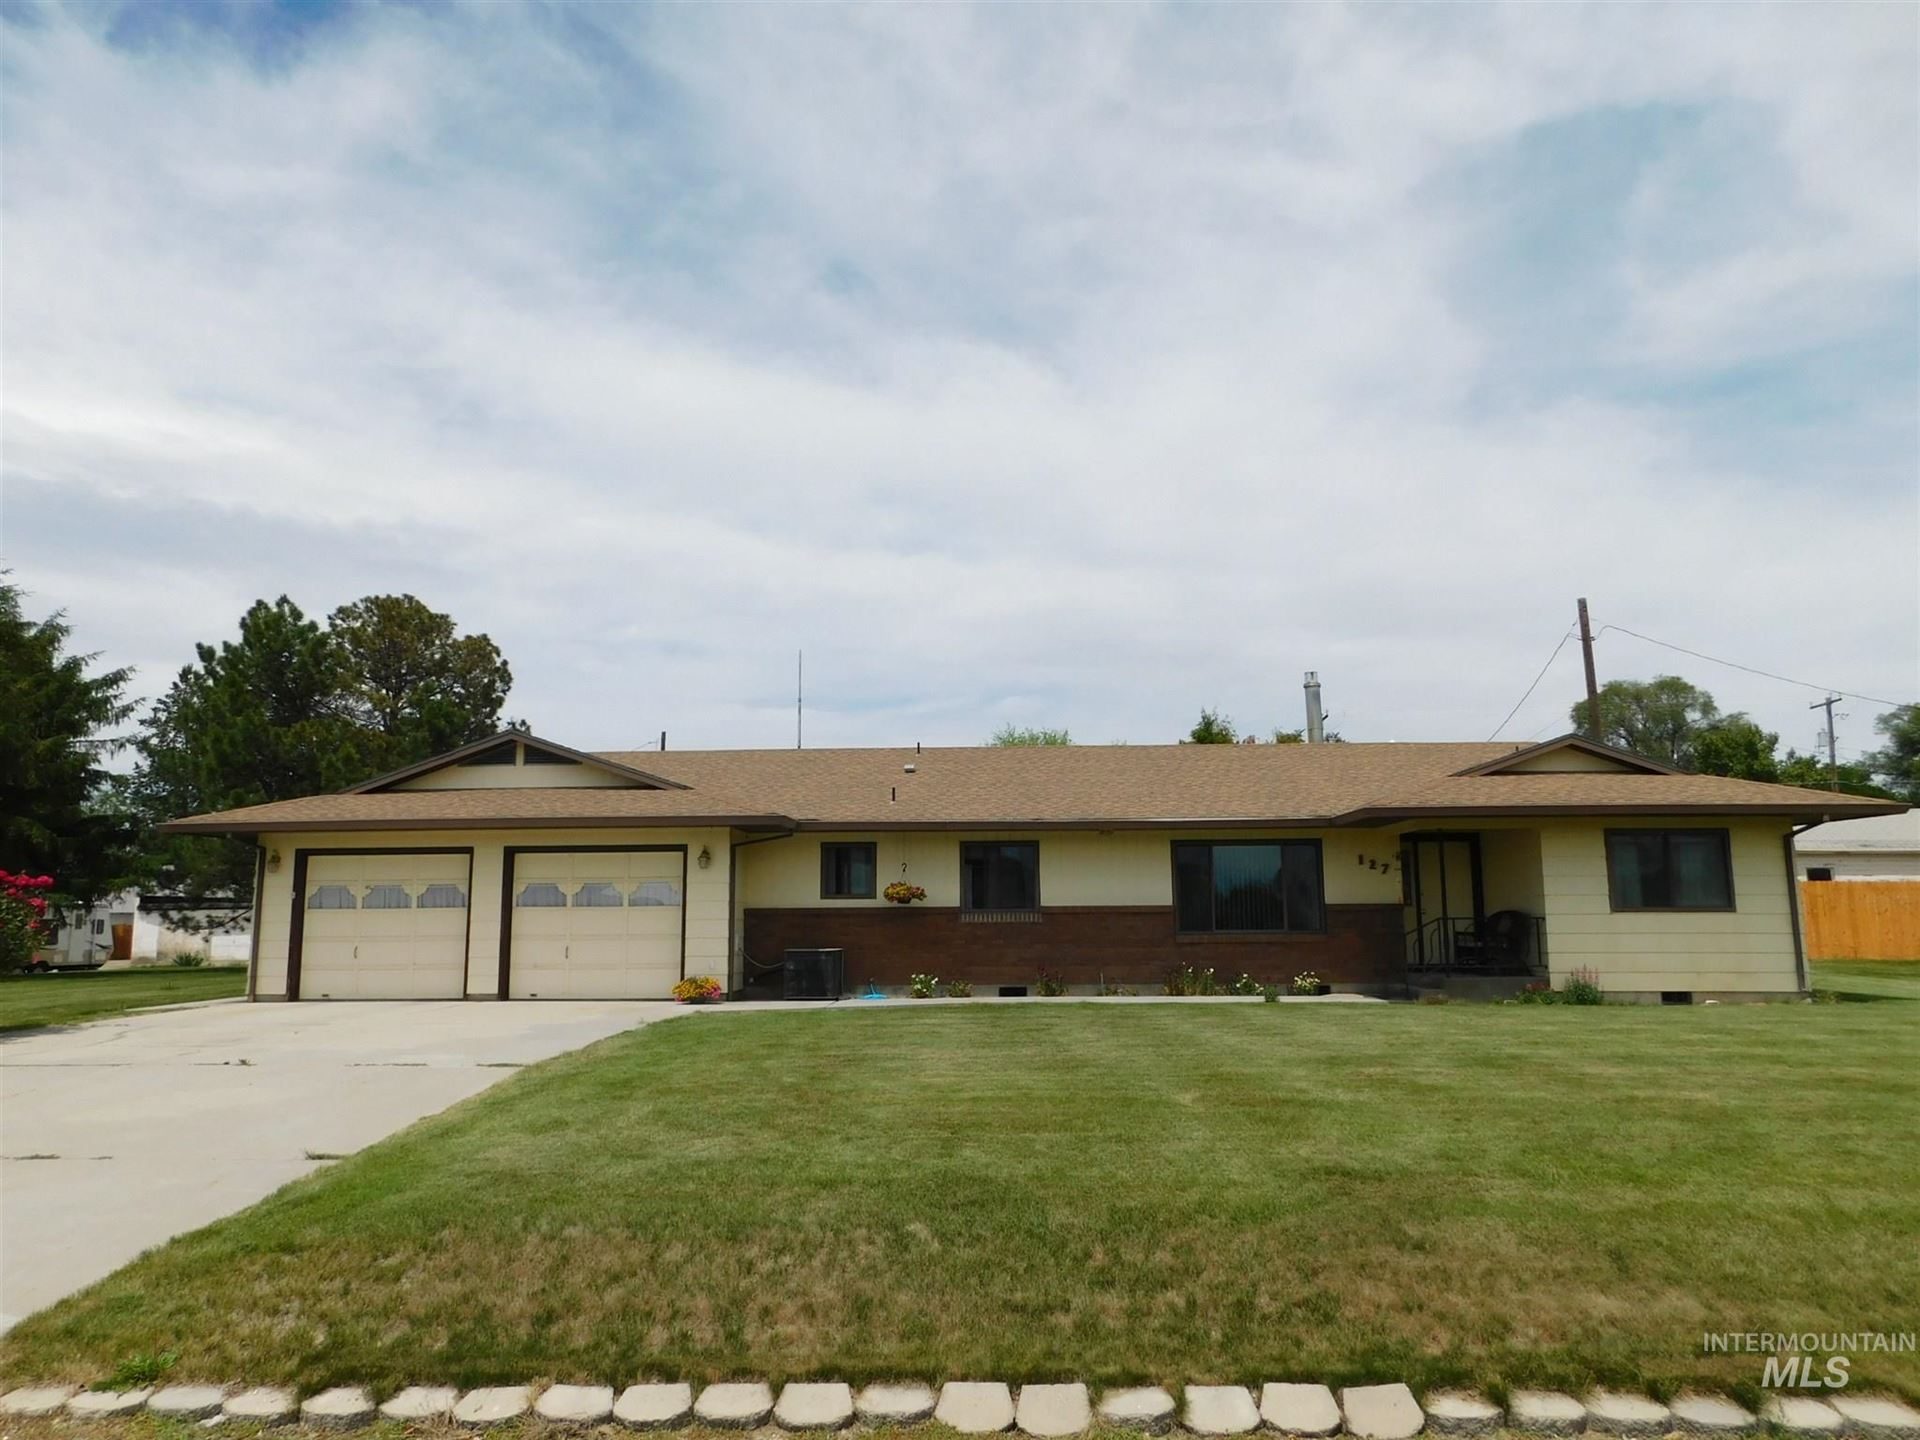 127 E Colorado, Homedale, ID 83628 - MLS#: 98759709